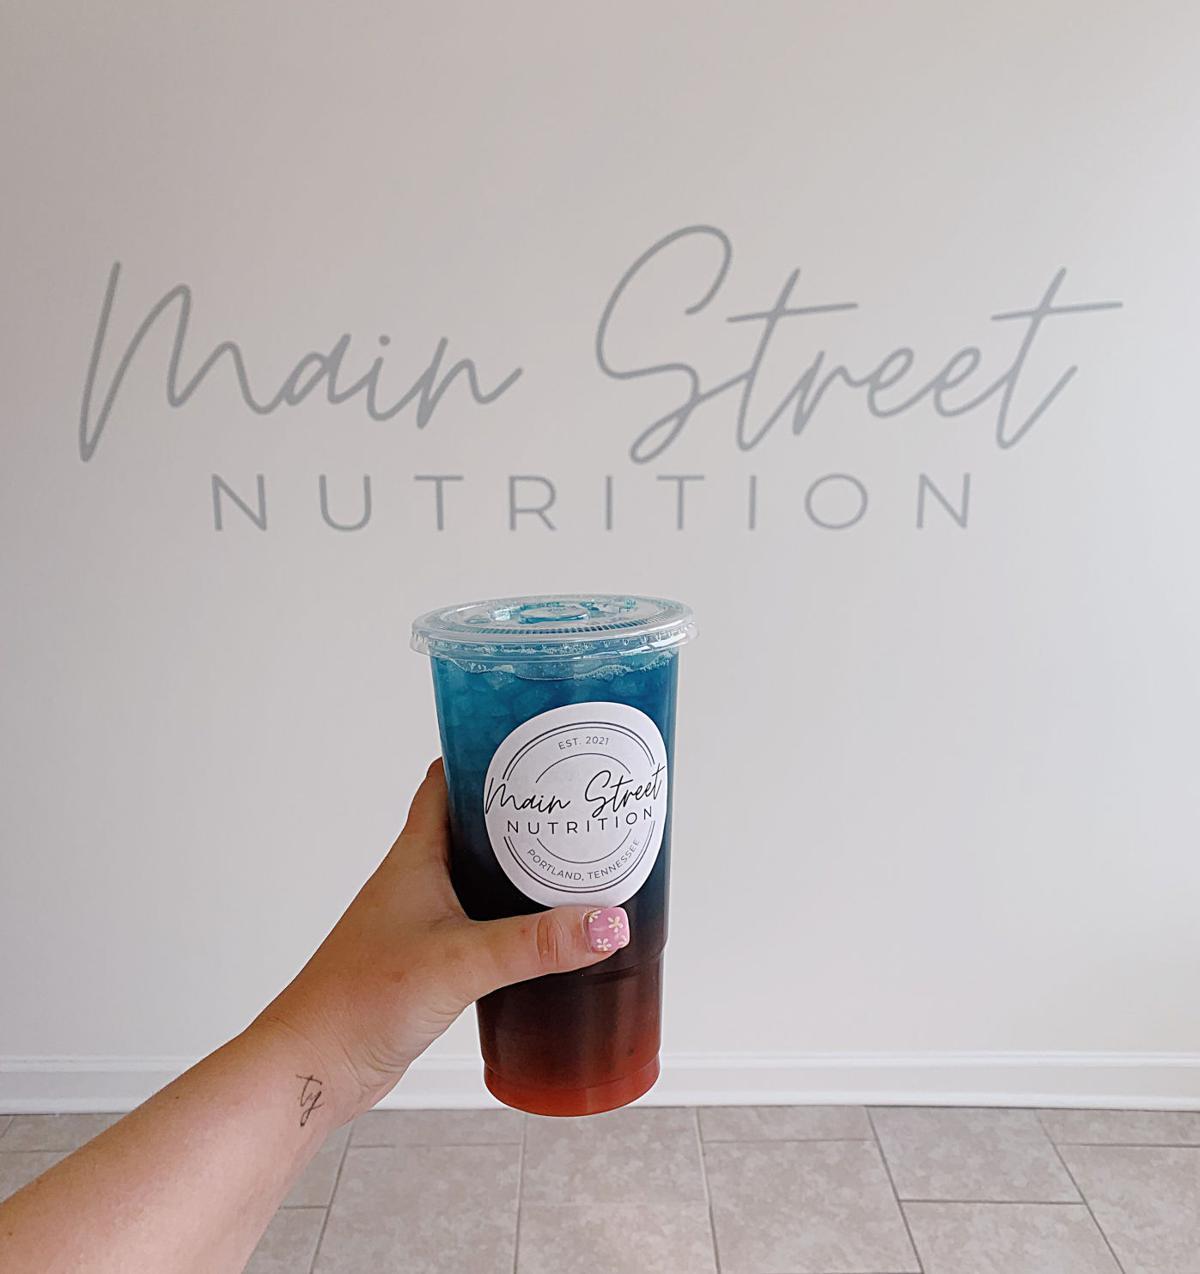 MAIN STREET NUTRITION OPENS PHOTO 1